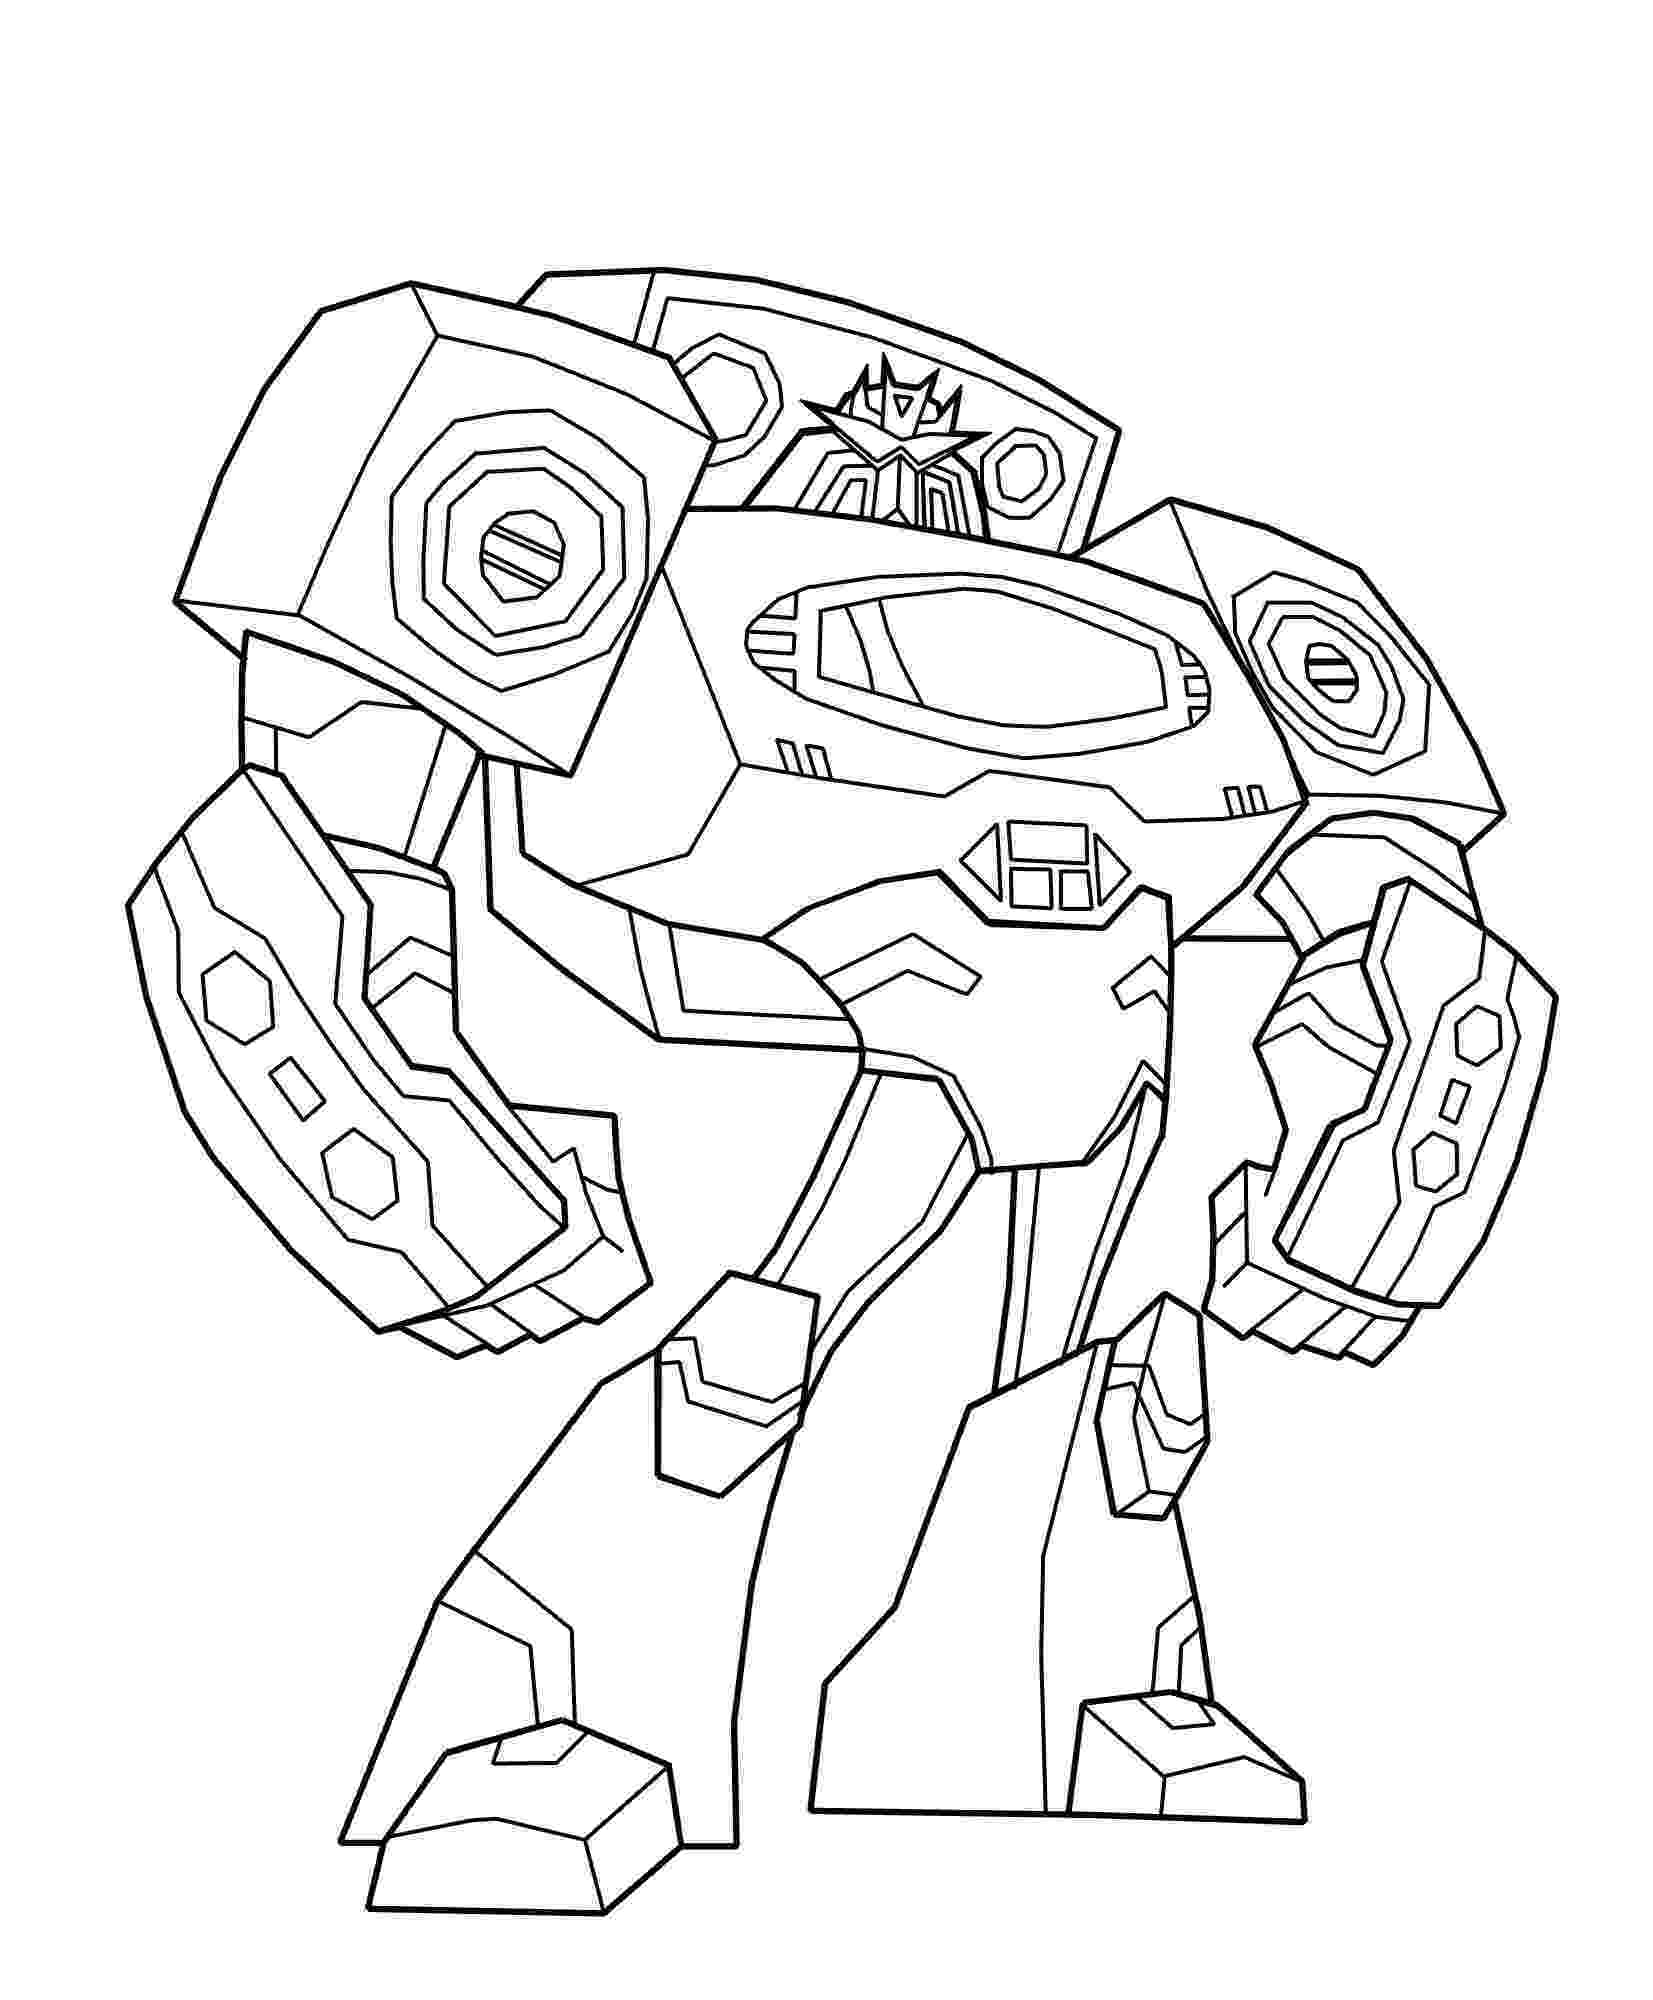 transformer coloring page free printable transformers coloring pages for kids transformer page coloring